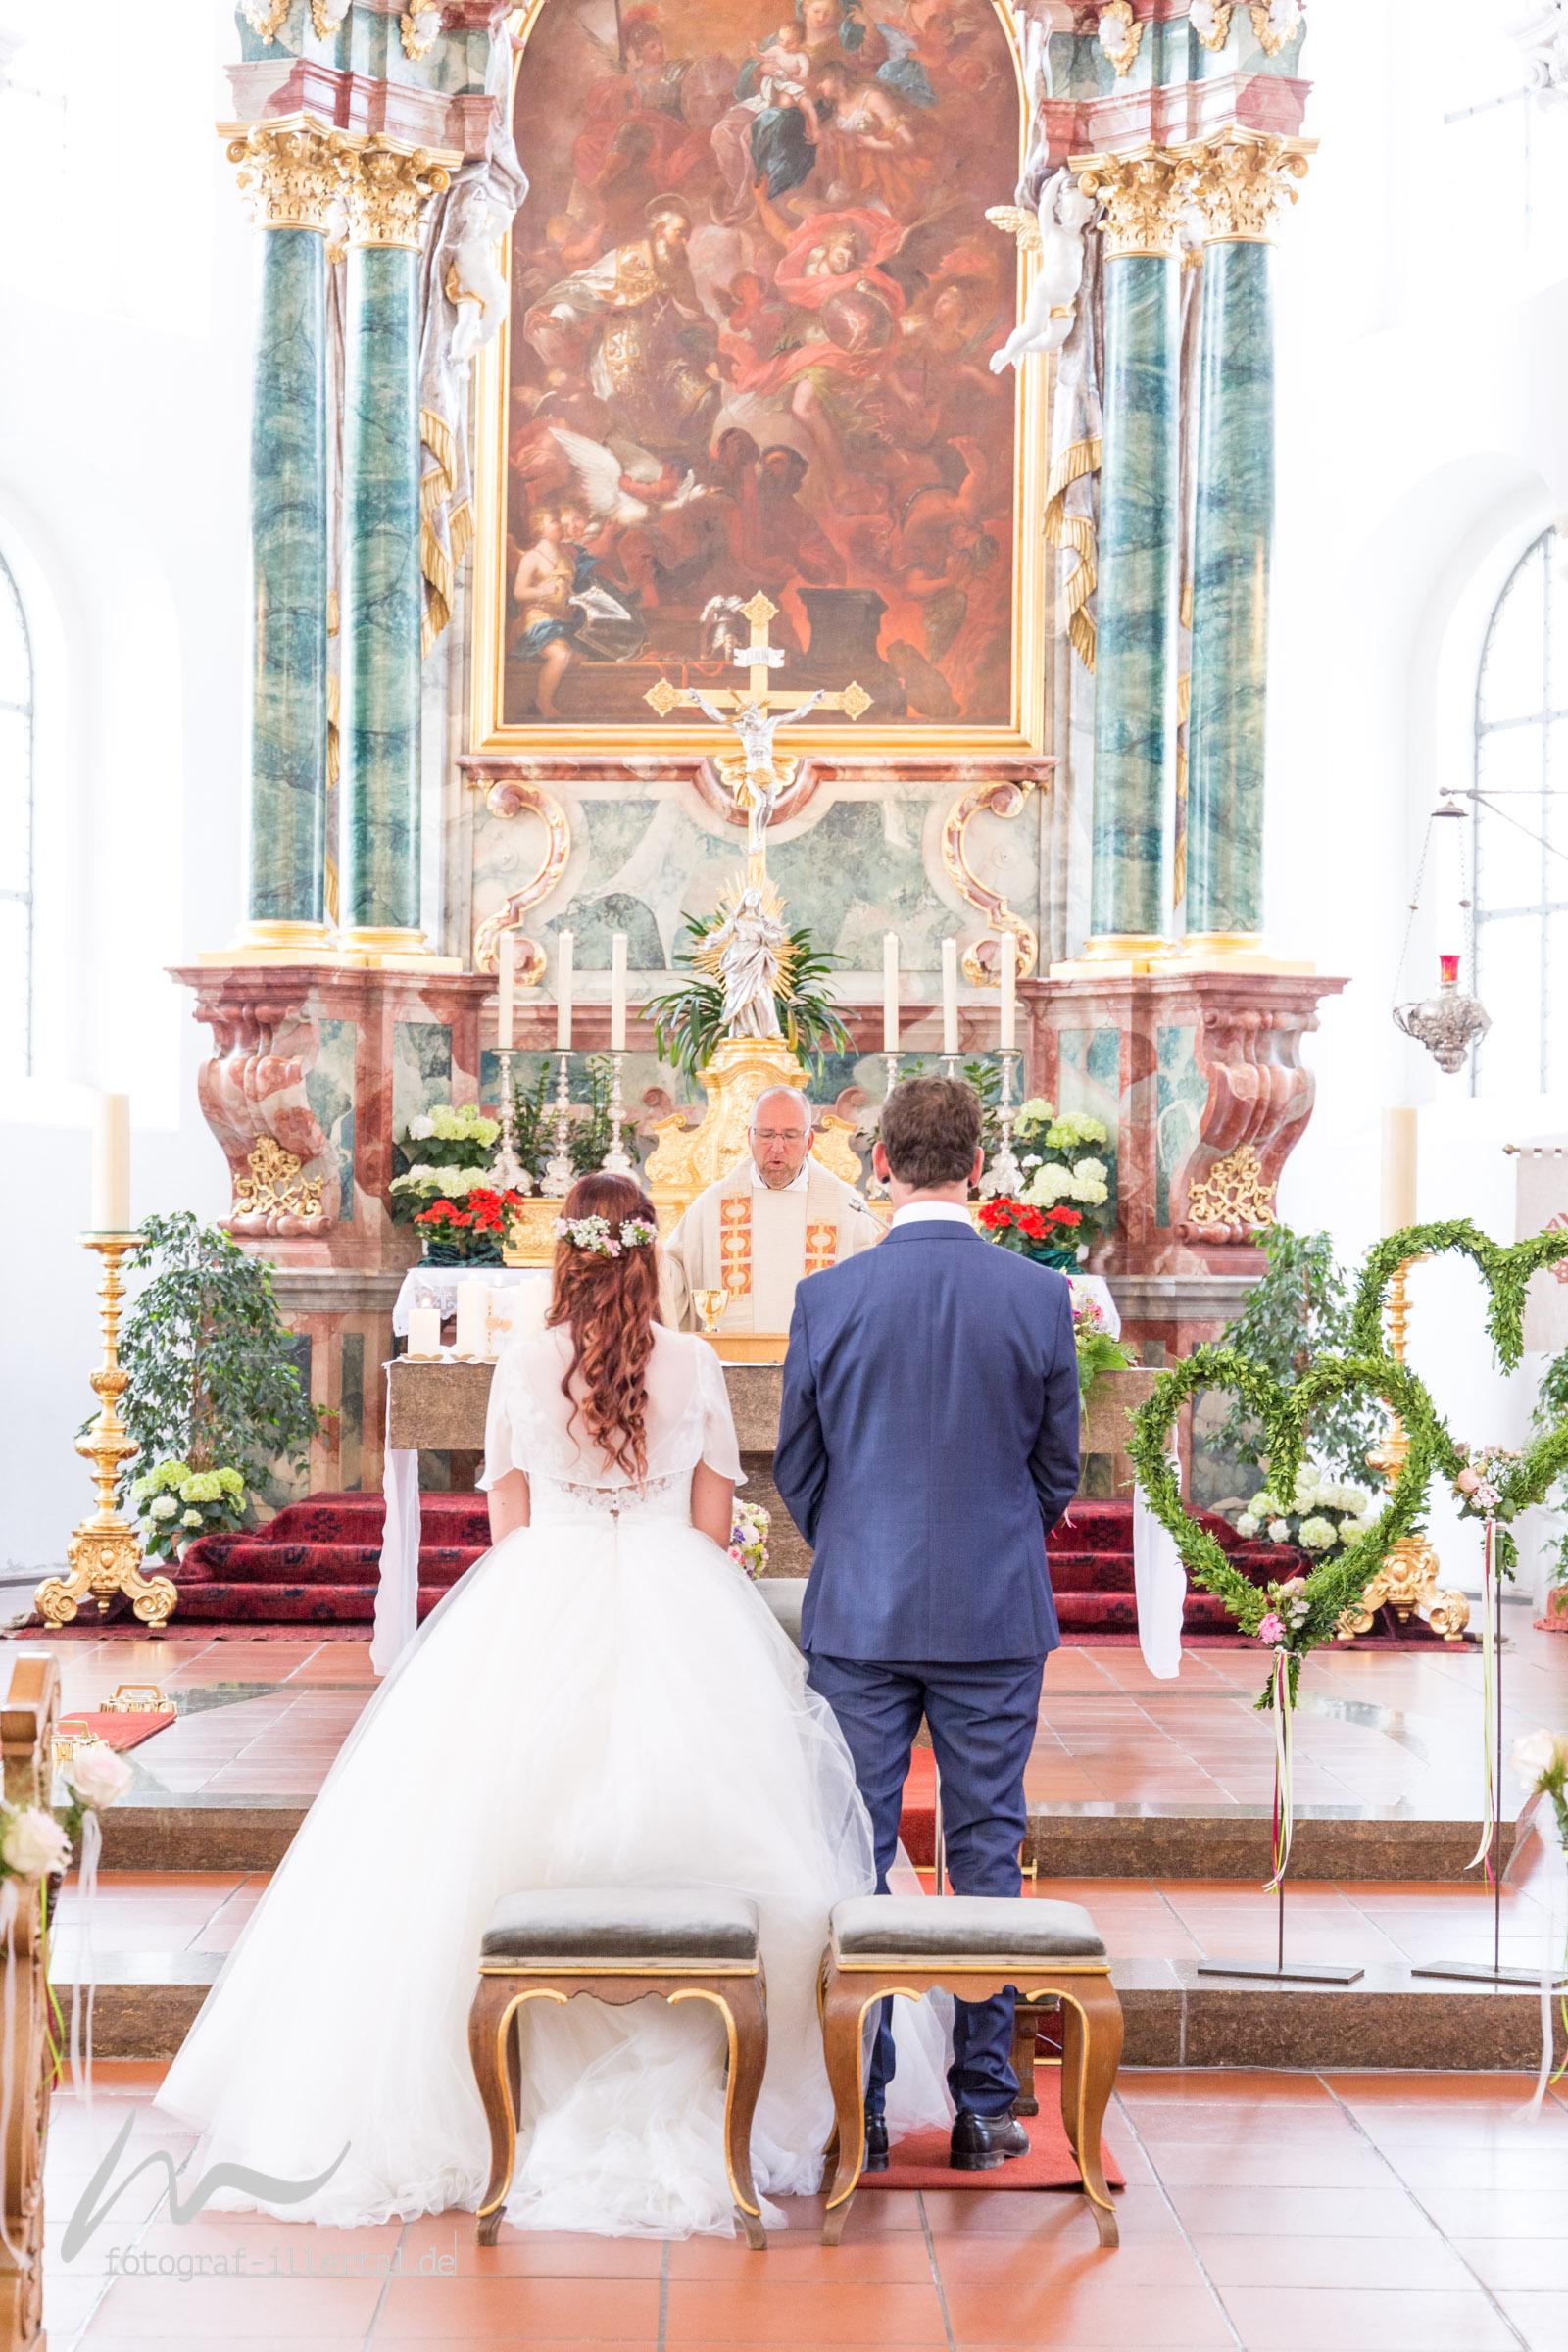 Fotograf Illertal-Christian Miller-Hochzeitsfotografie-_MG_2190